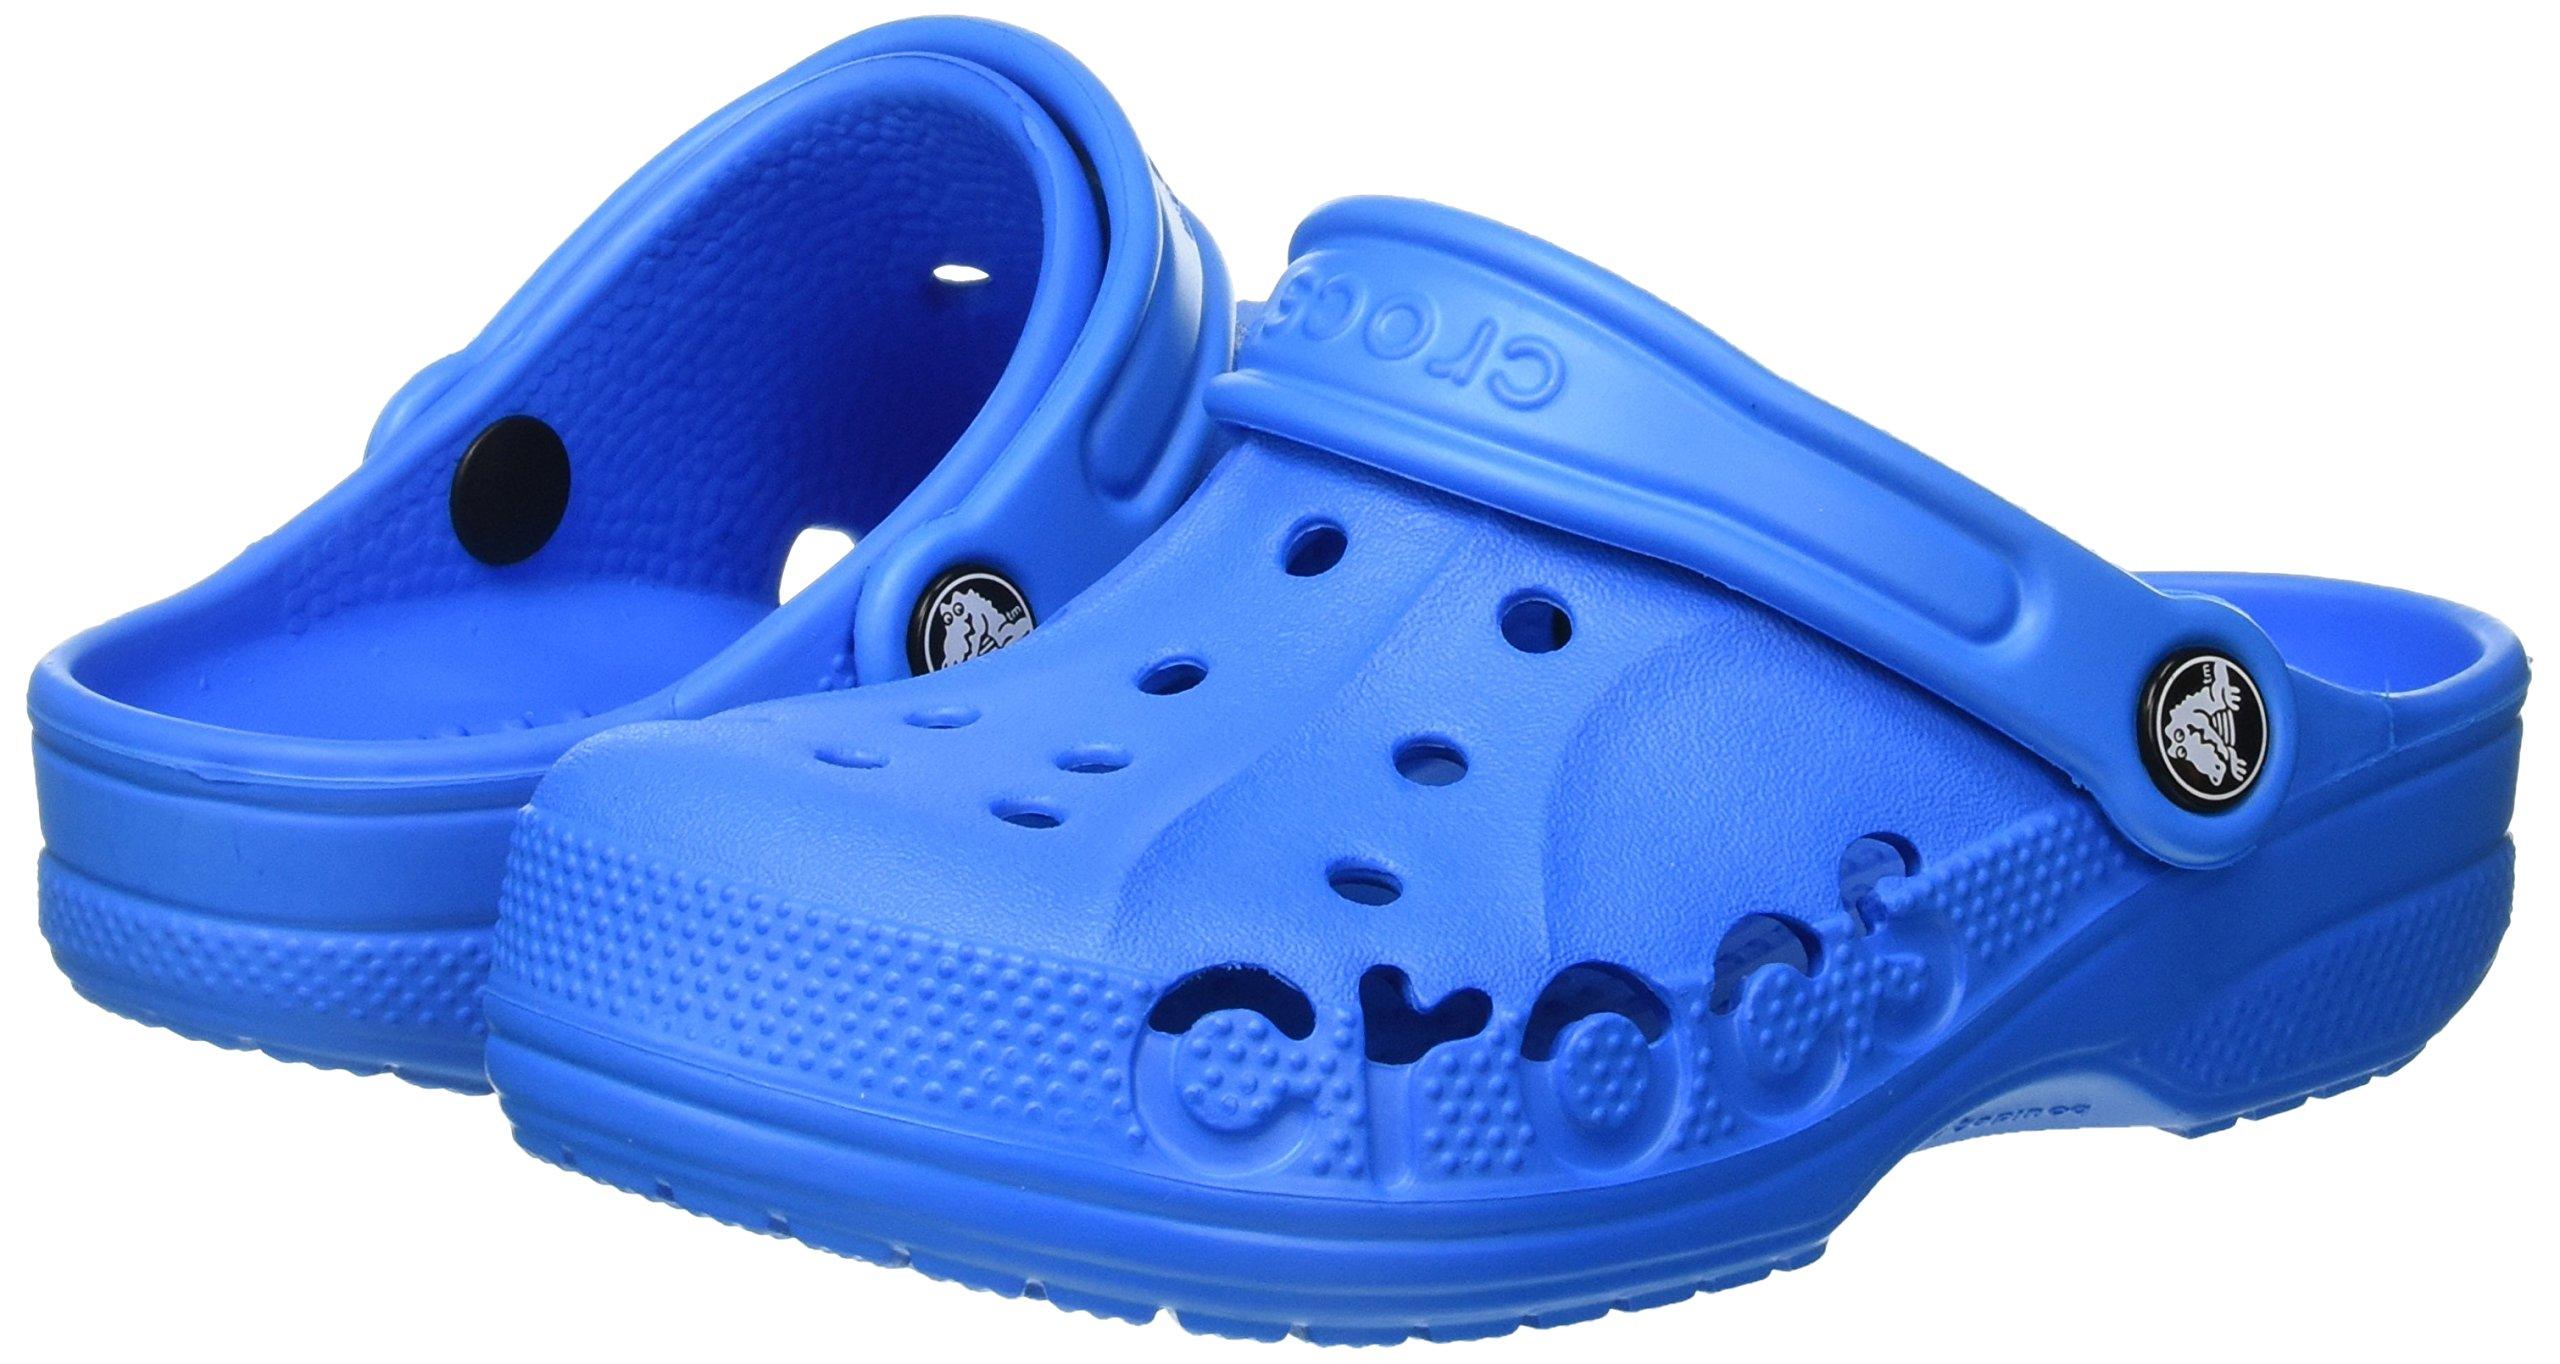 Crocs Kids' Baya 10190 Clog, Ocean, 8-9 M US Toddler by Crocs (Image #5)